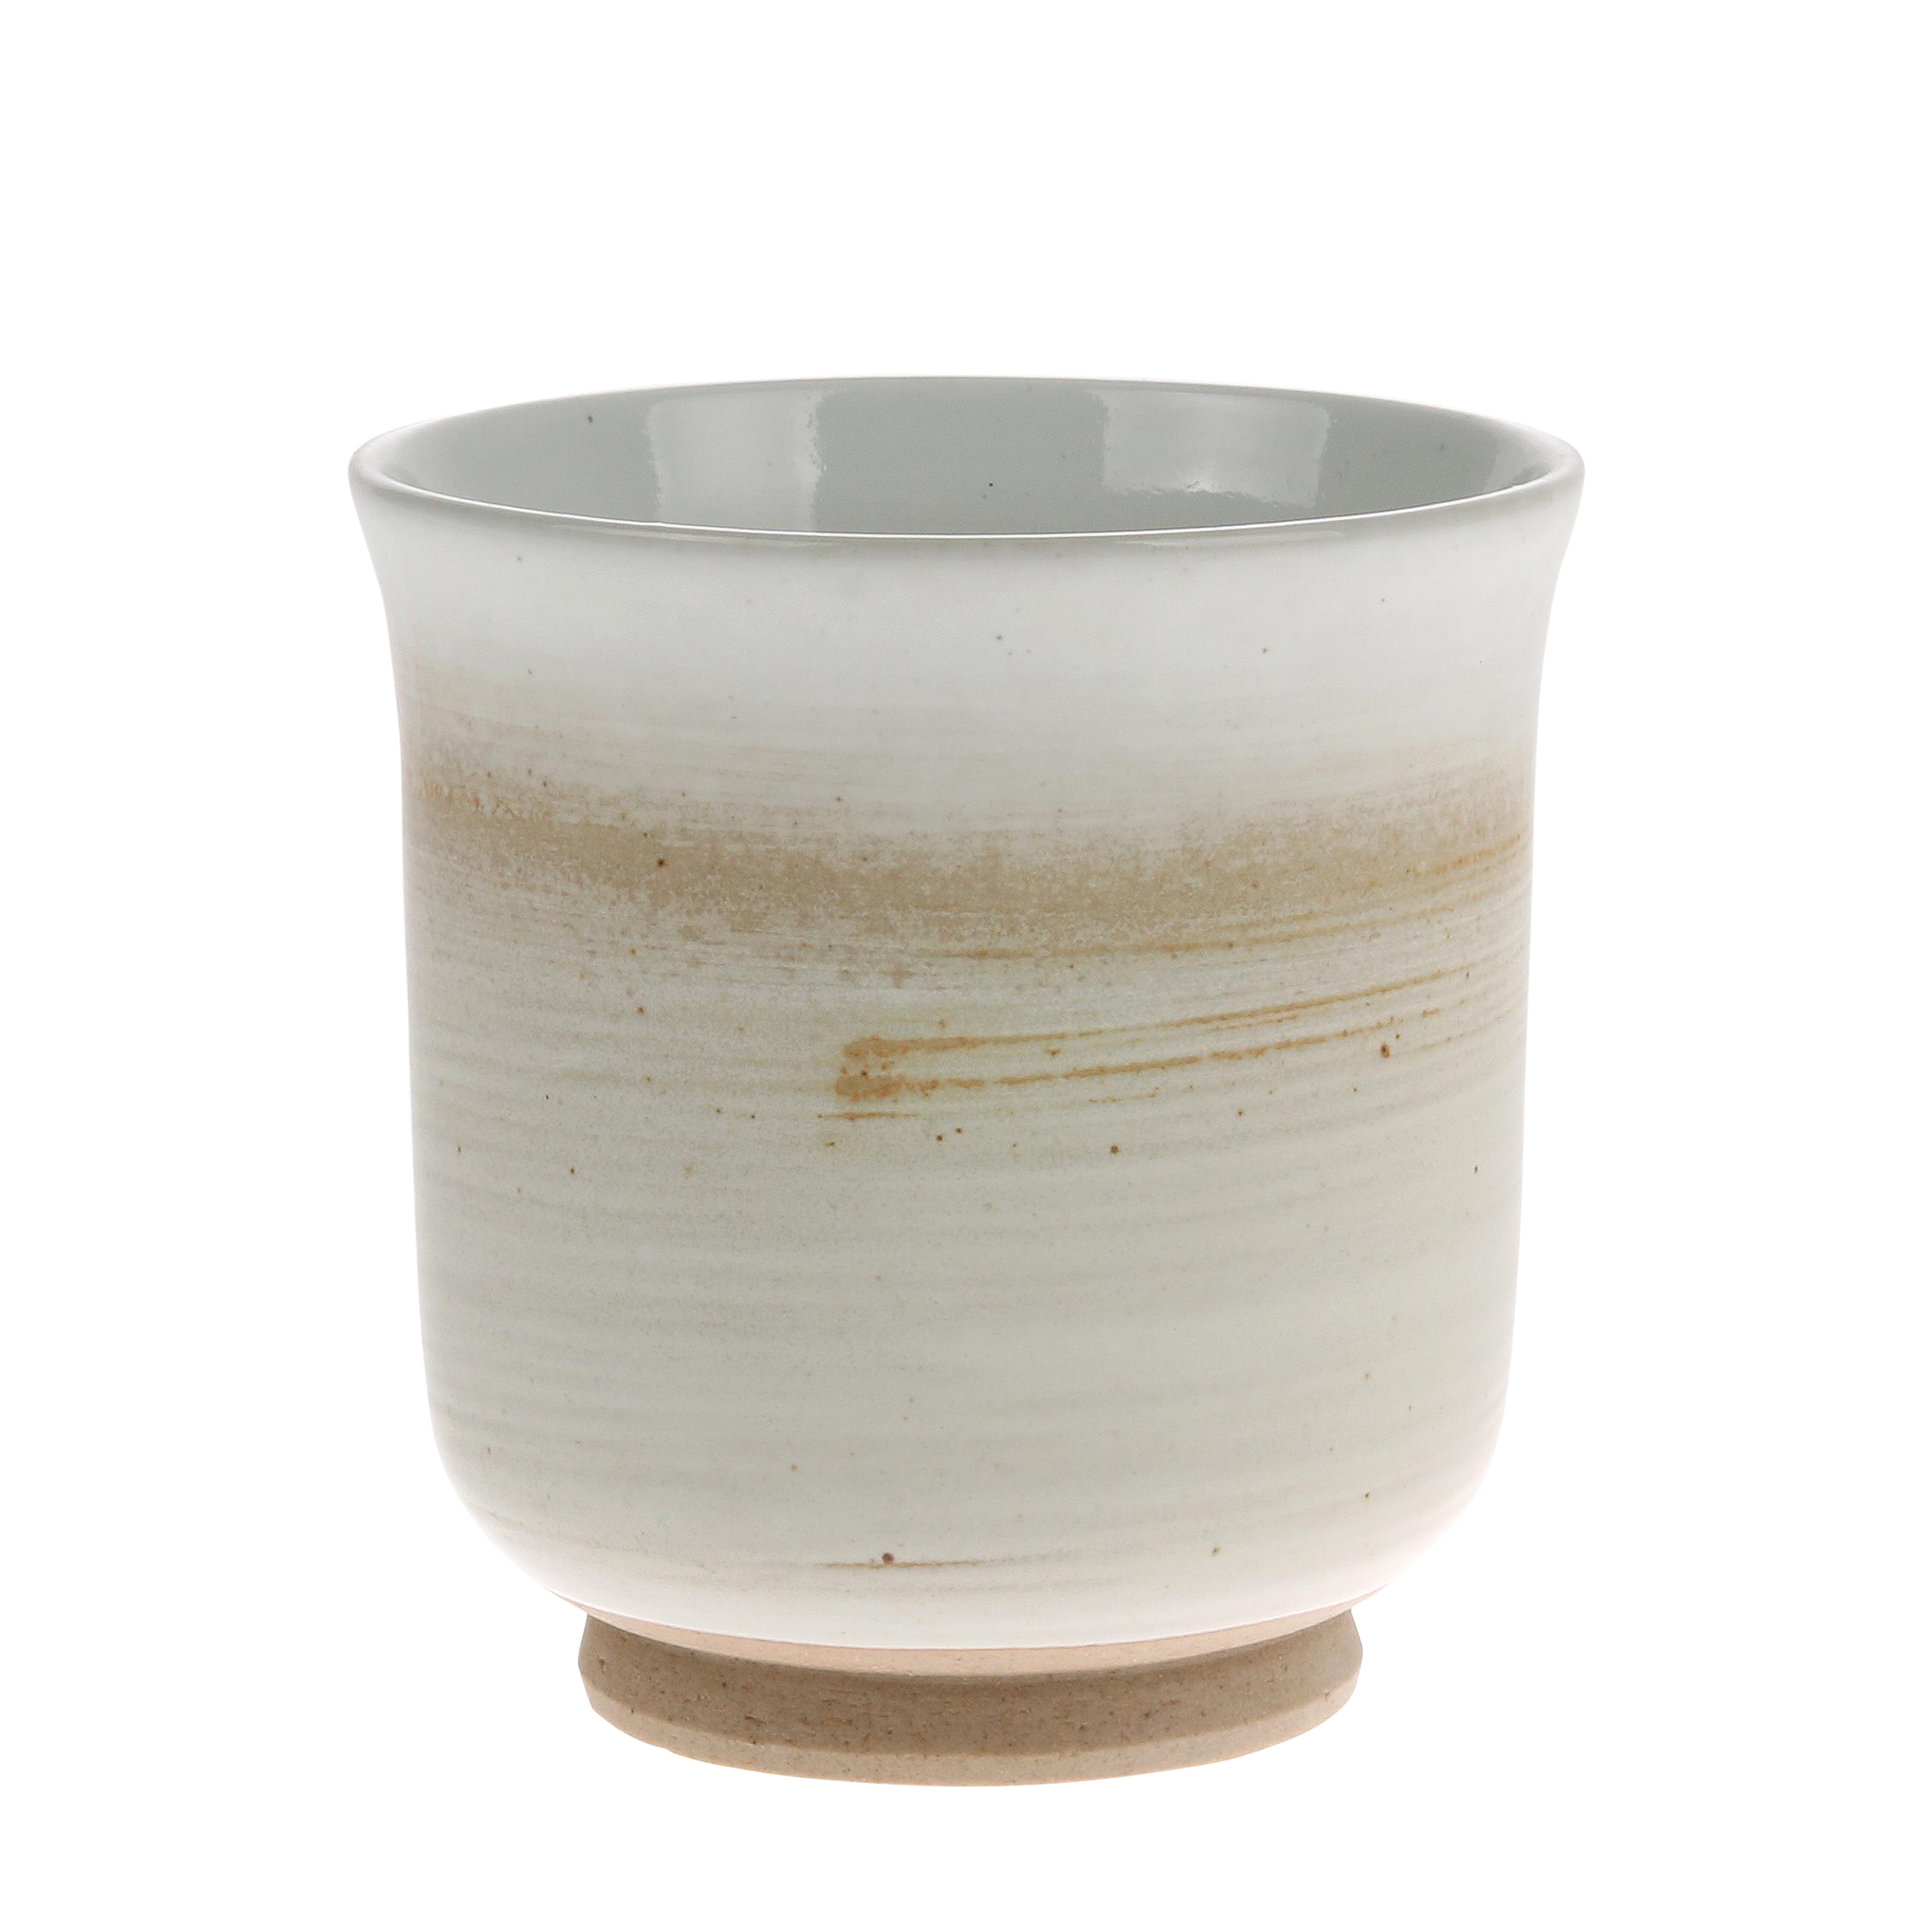 HK Living Kyoto Ceramics Becher creme white